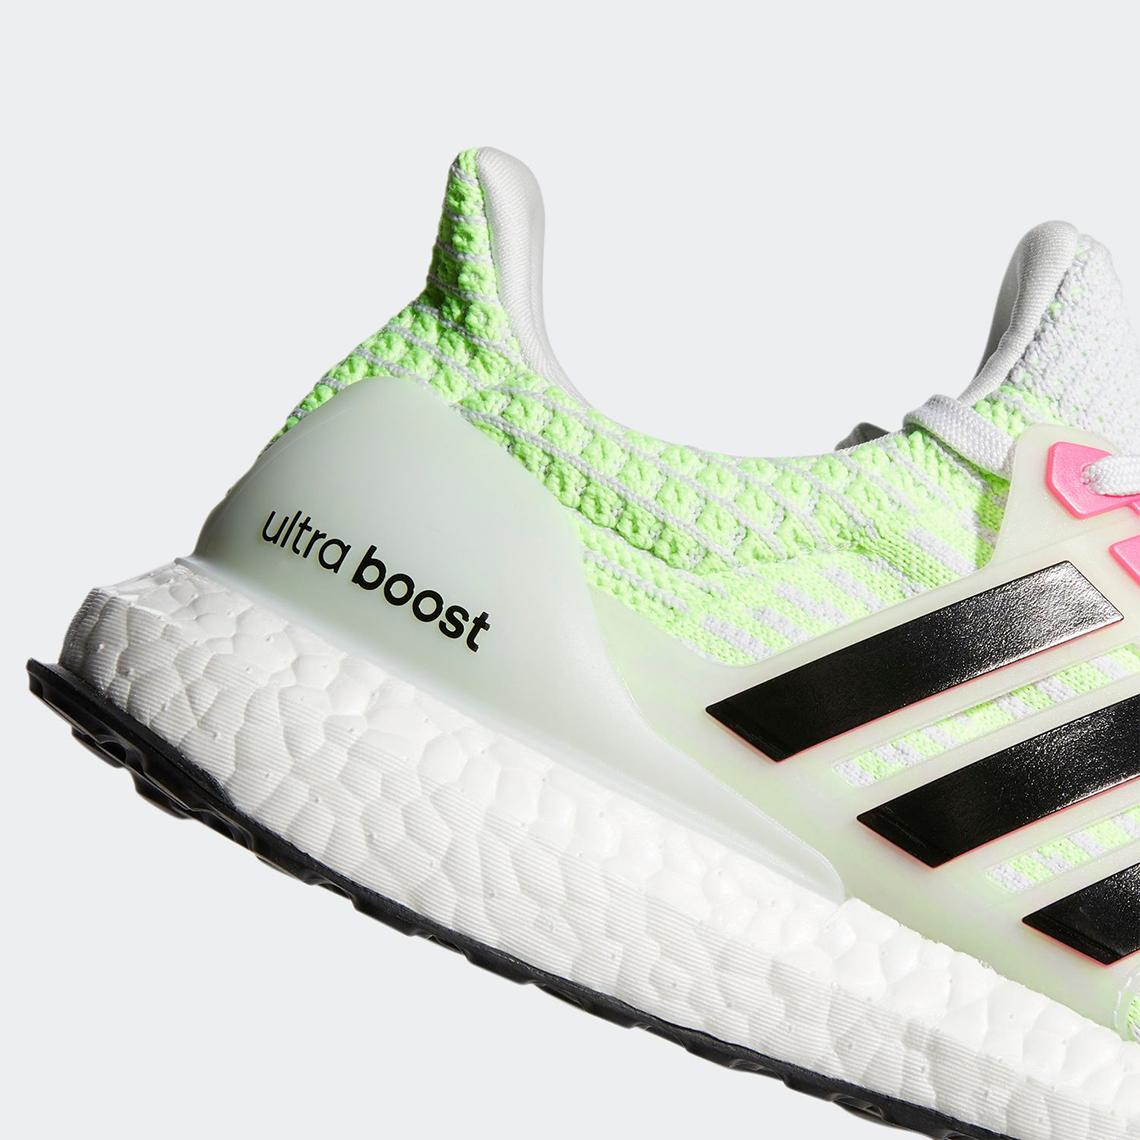 adidas Ultra Boost DNA 5.0 G58755 | SneakerNews.com